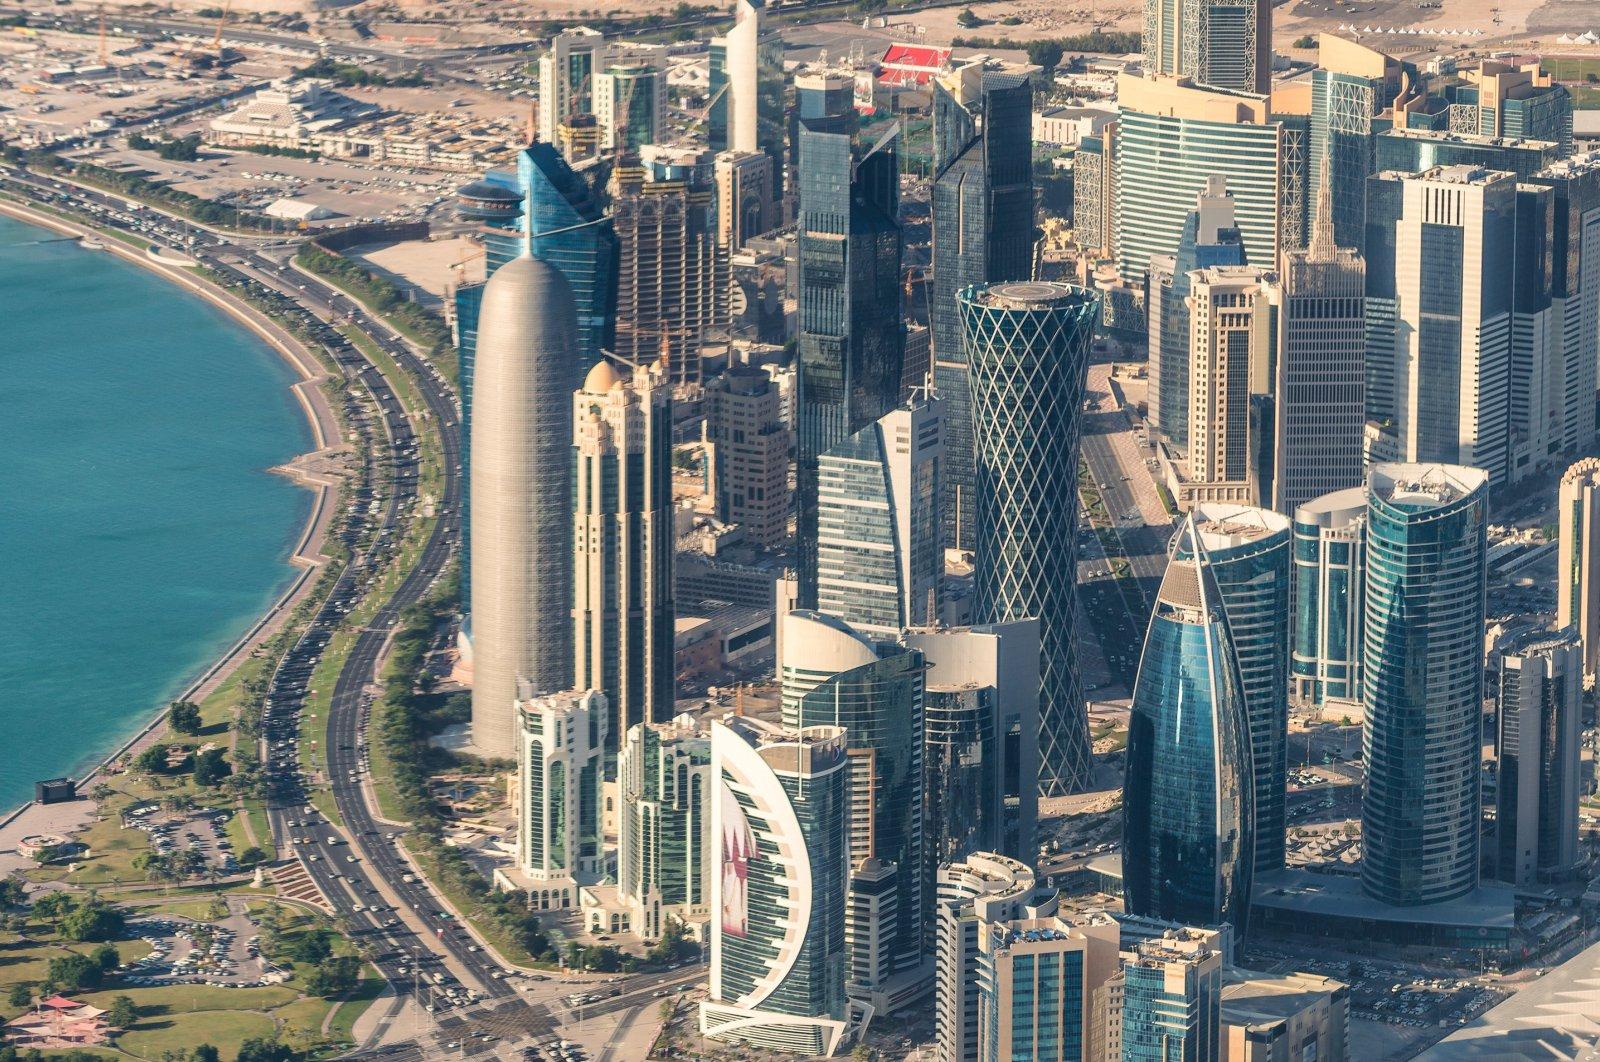 The skyline of Qatari capital Doha.  (Shutterstock Photo)